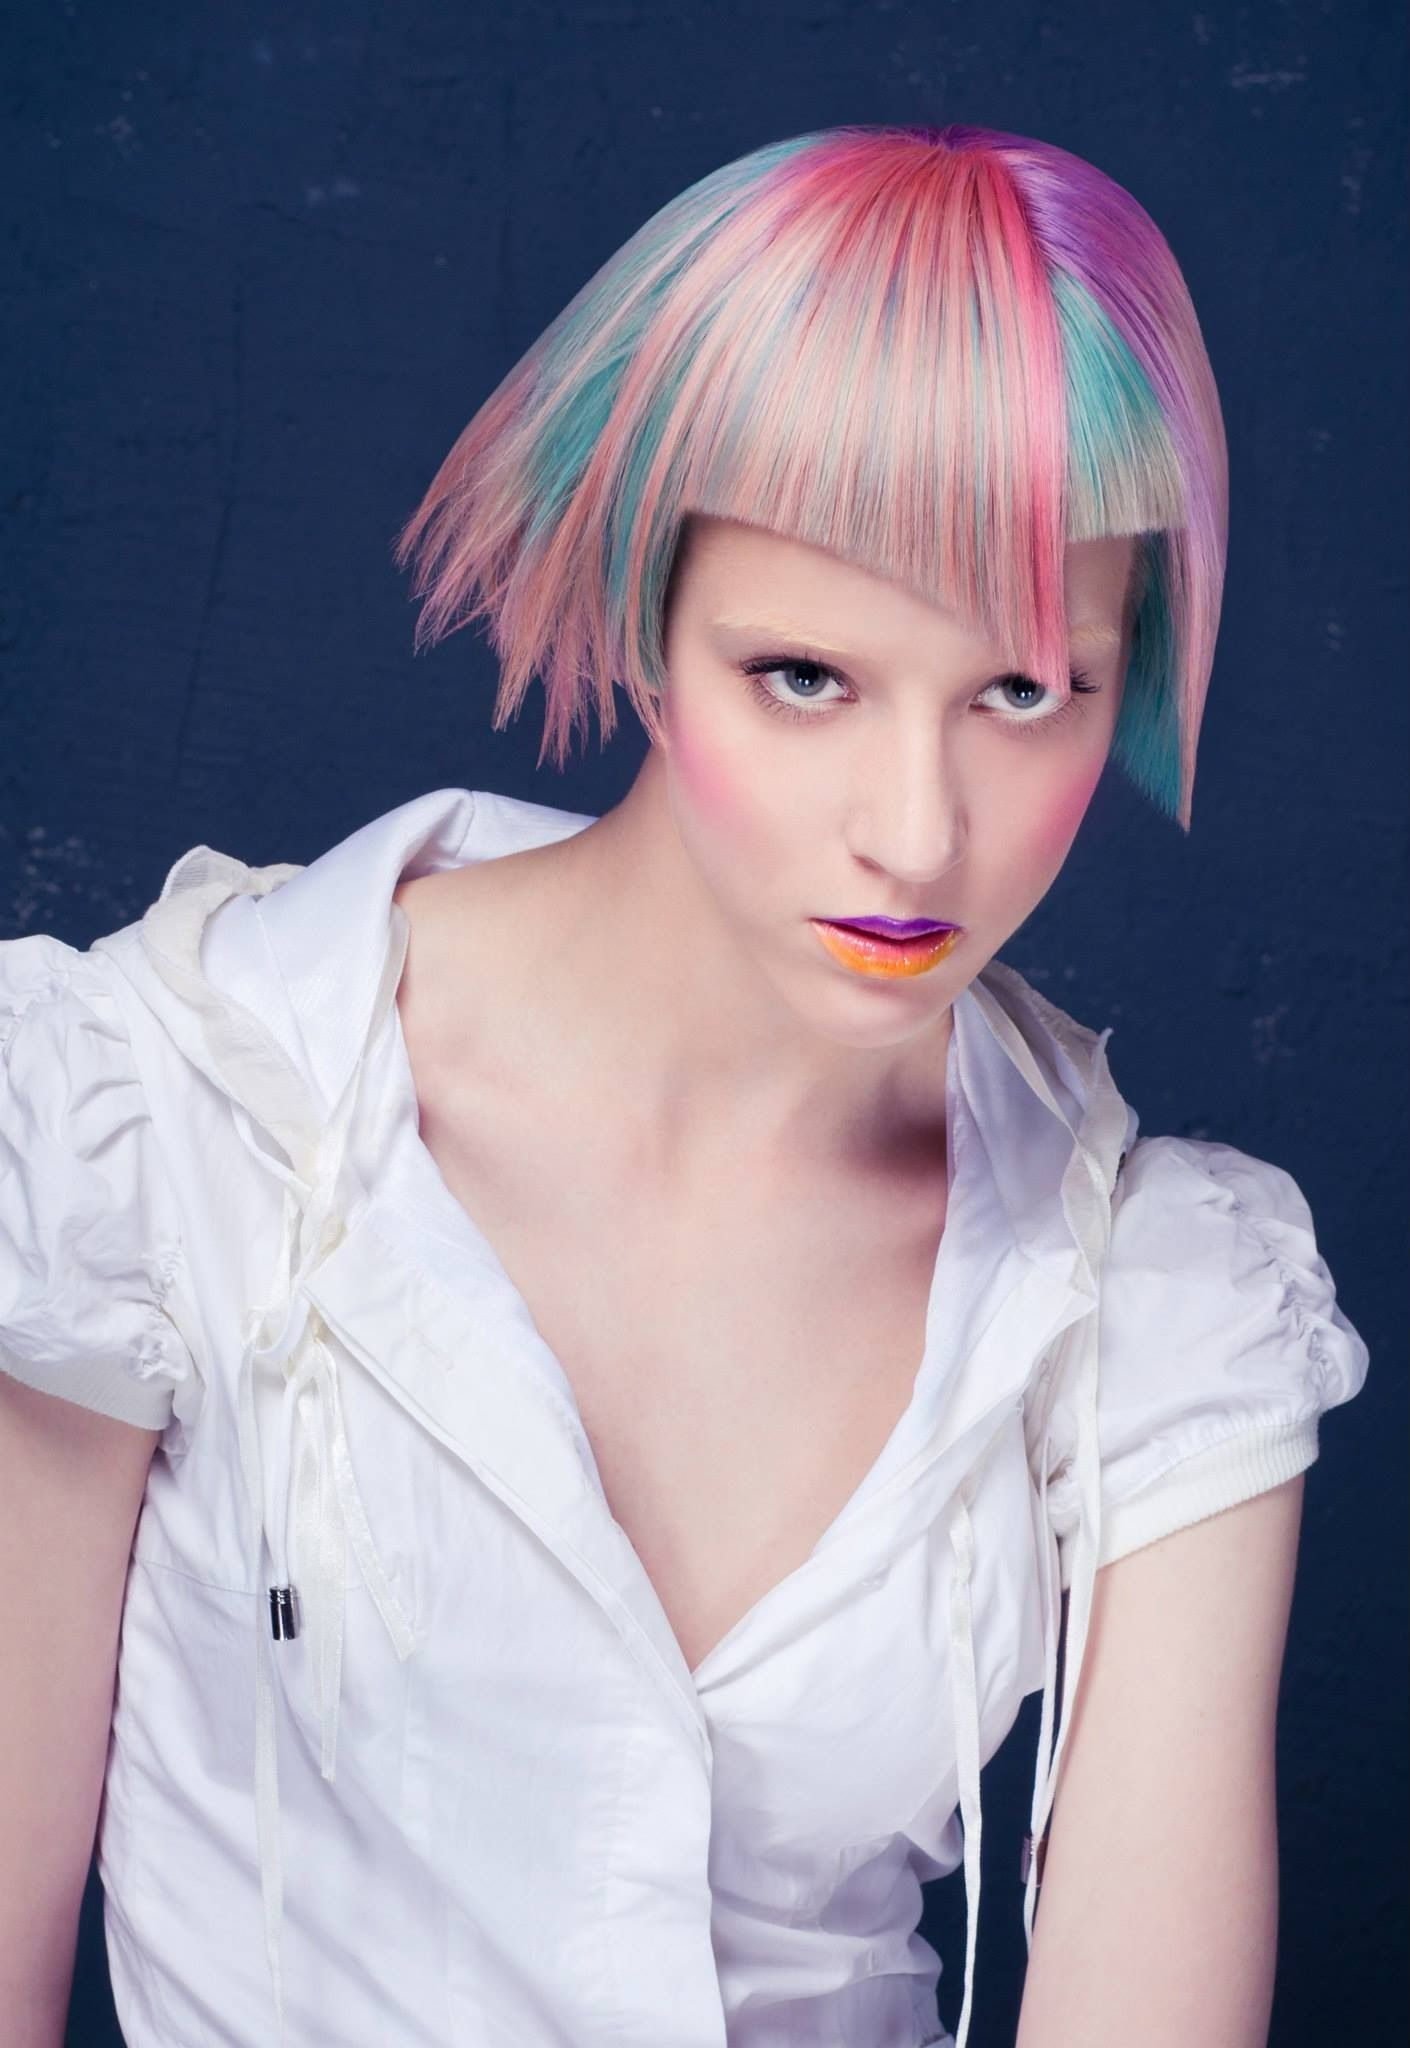 Funky Hair Hair Color Hairstyles Pinterest Funky Hair Hair